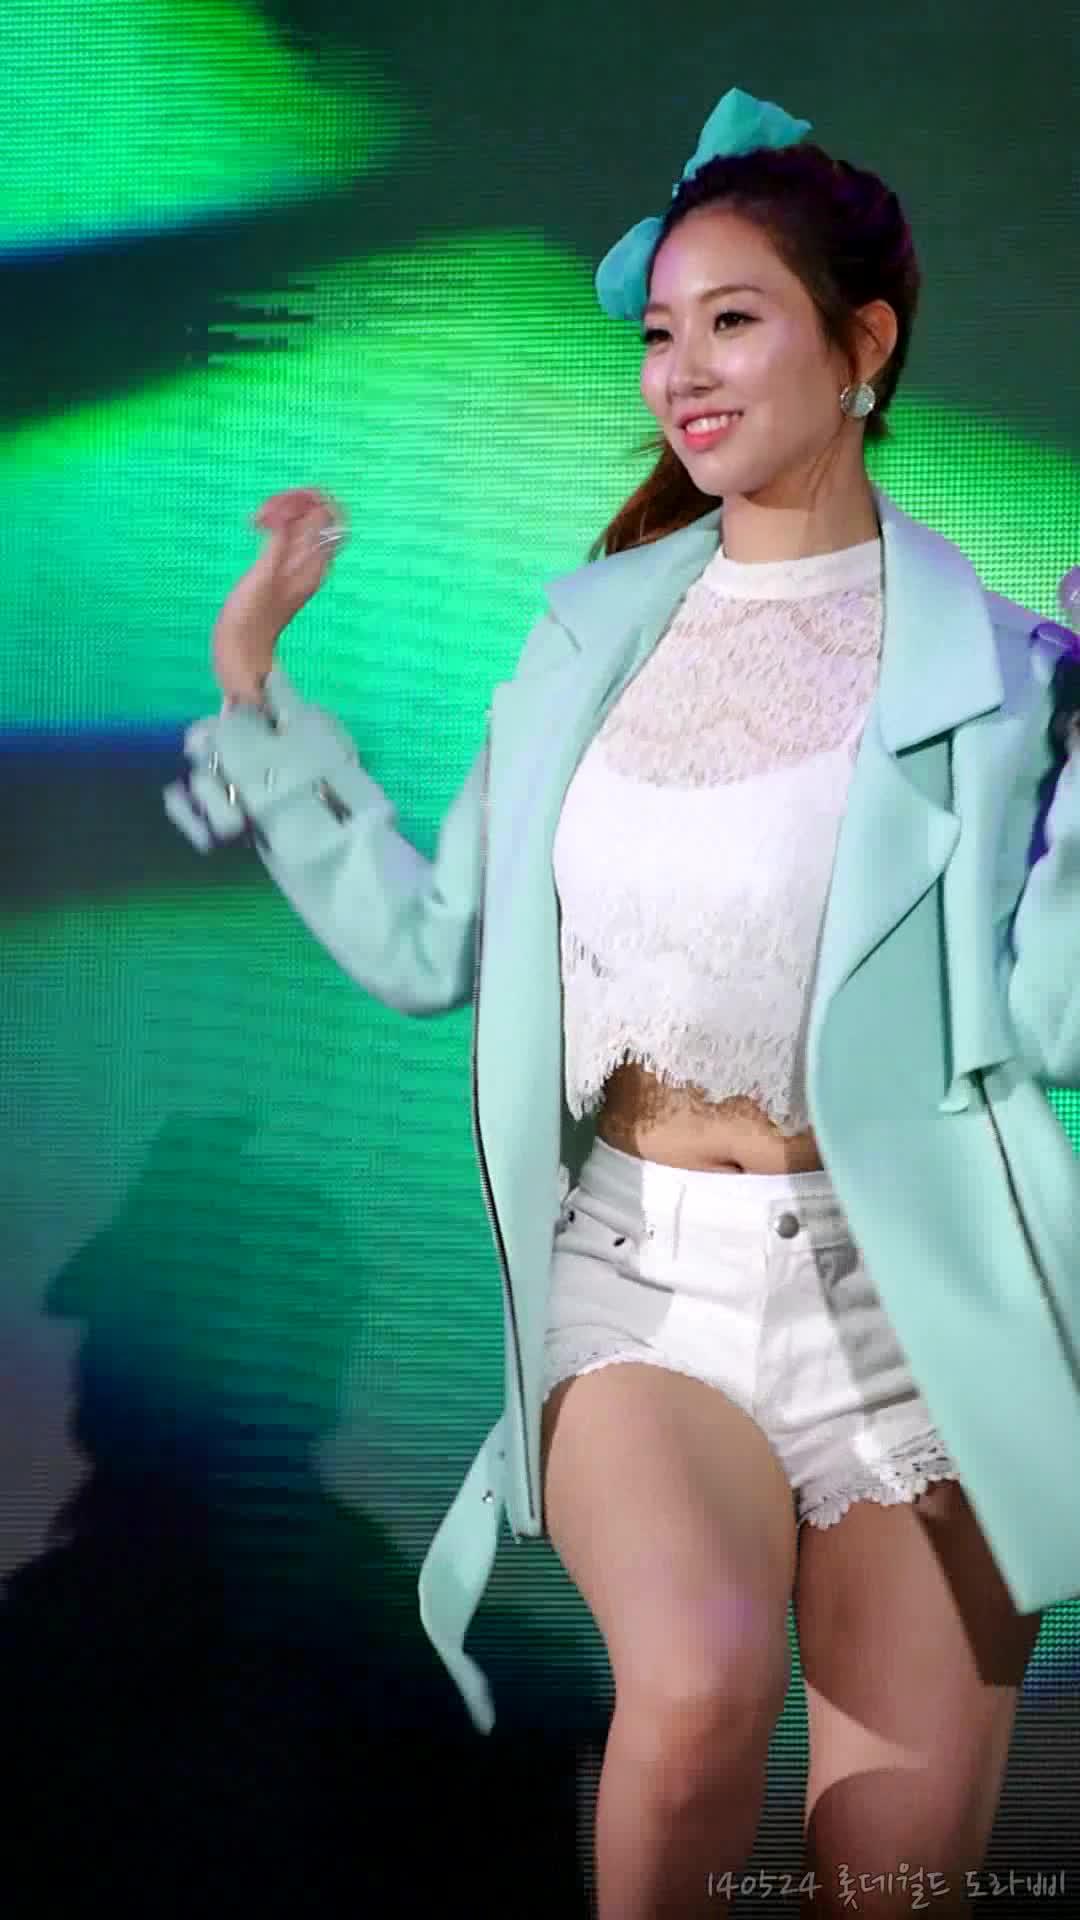 osugame, Song Dahye titty bounce GIFs